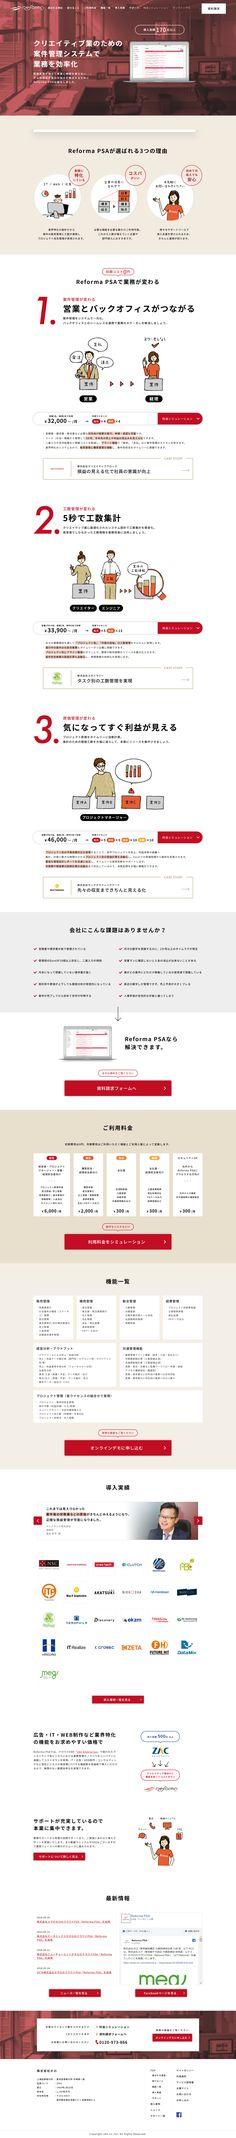 Web Design, Site Design, Flat Design, Graphic Design, Web Layout, Layout Design, Web Graph, Web Japan, Web Inspiration